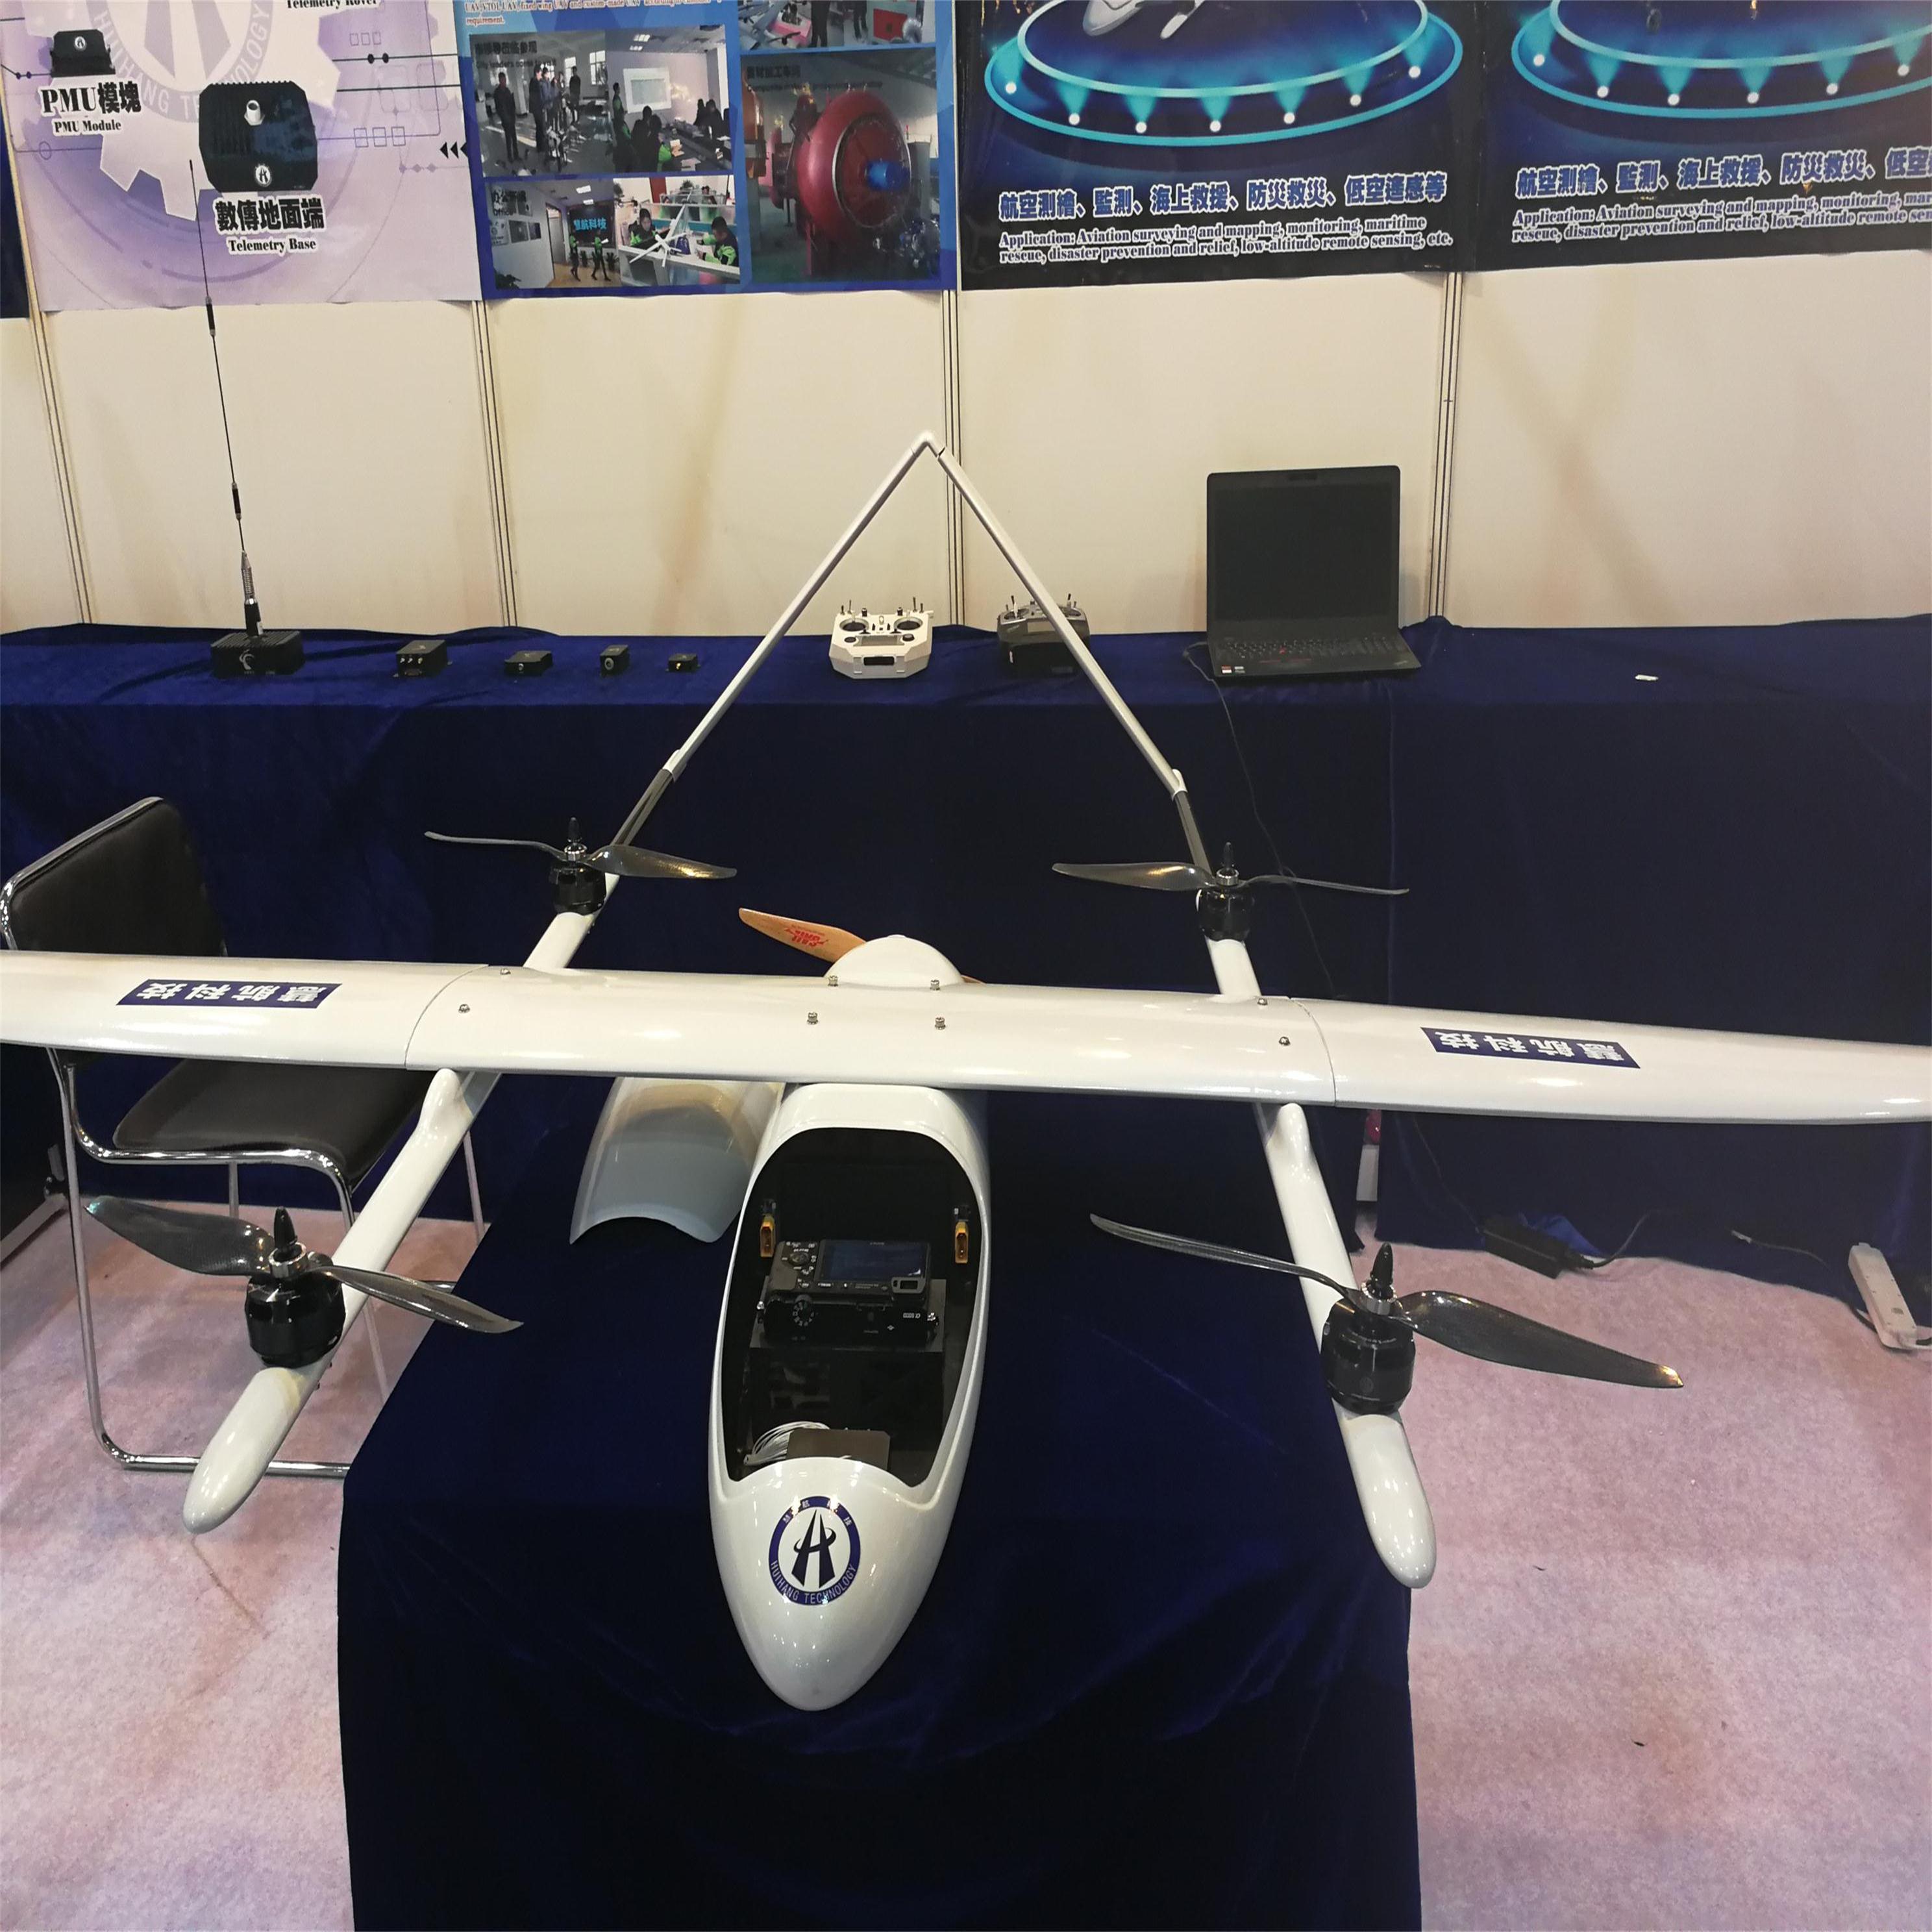 Sell long range uav hybrid wing VTOL drone surveying UAV mapping drone